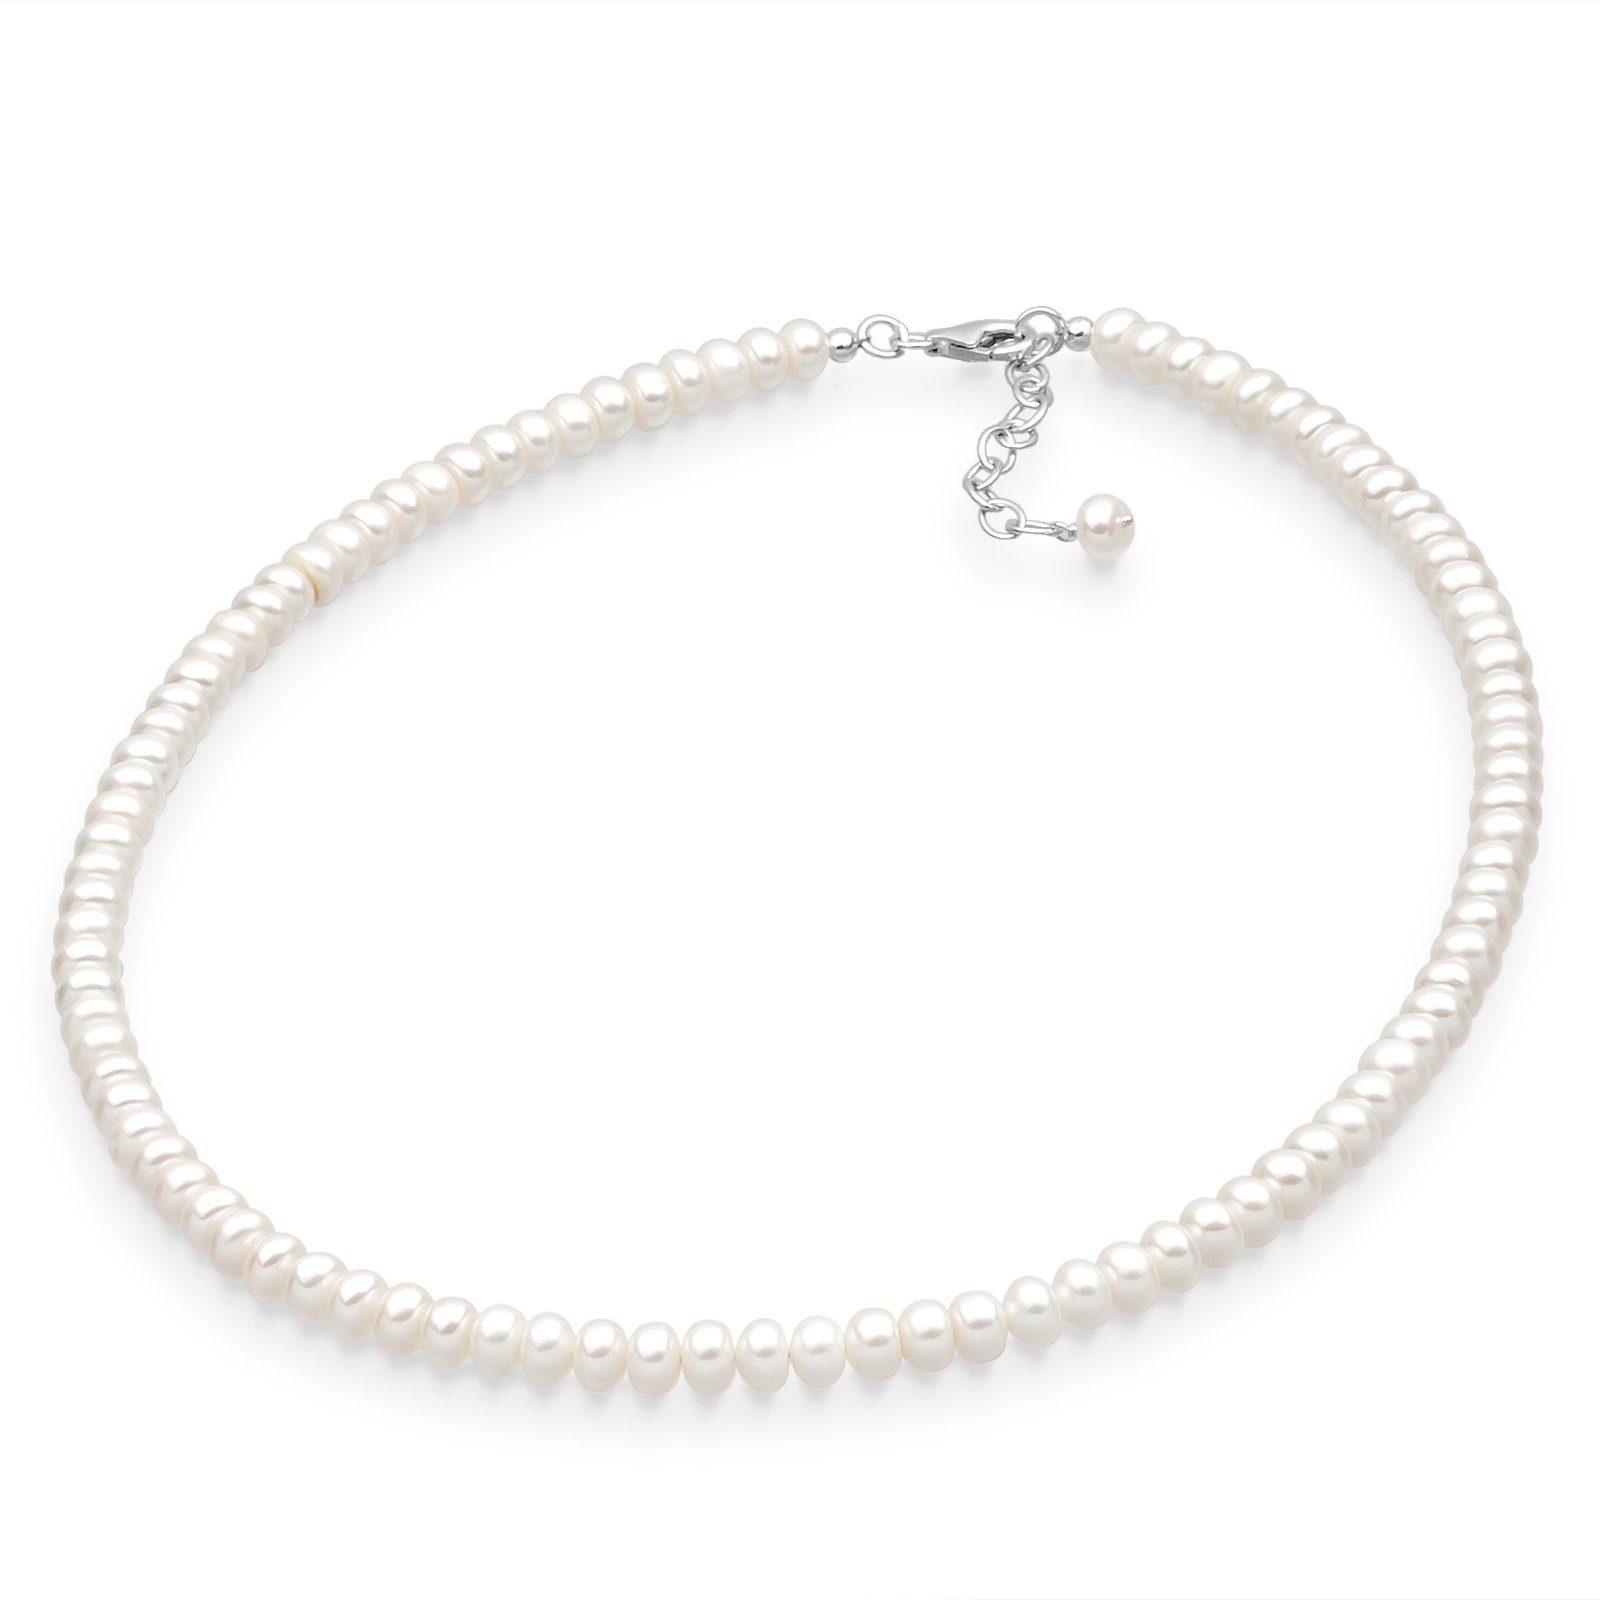 PERLU Perlenkette »Edel Süßwasserzuchtperlen 925 Sterling Silber«